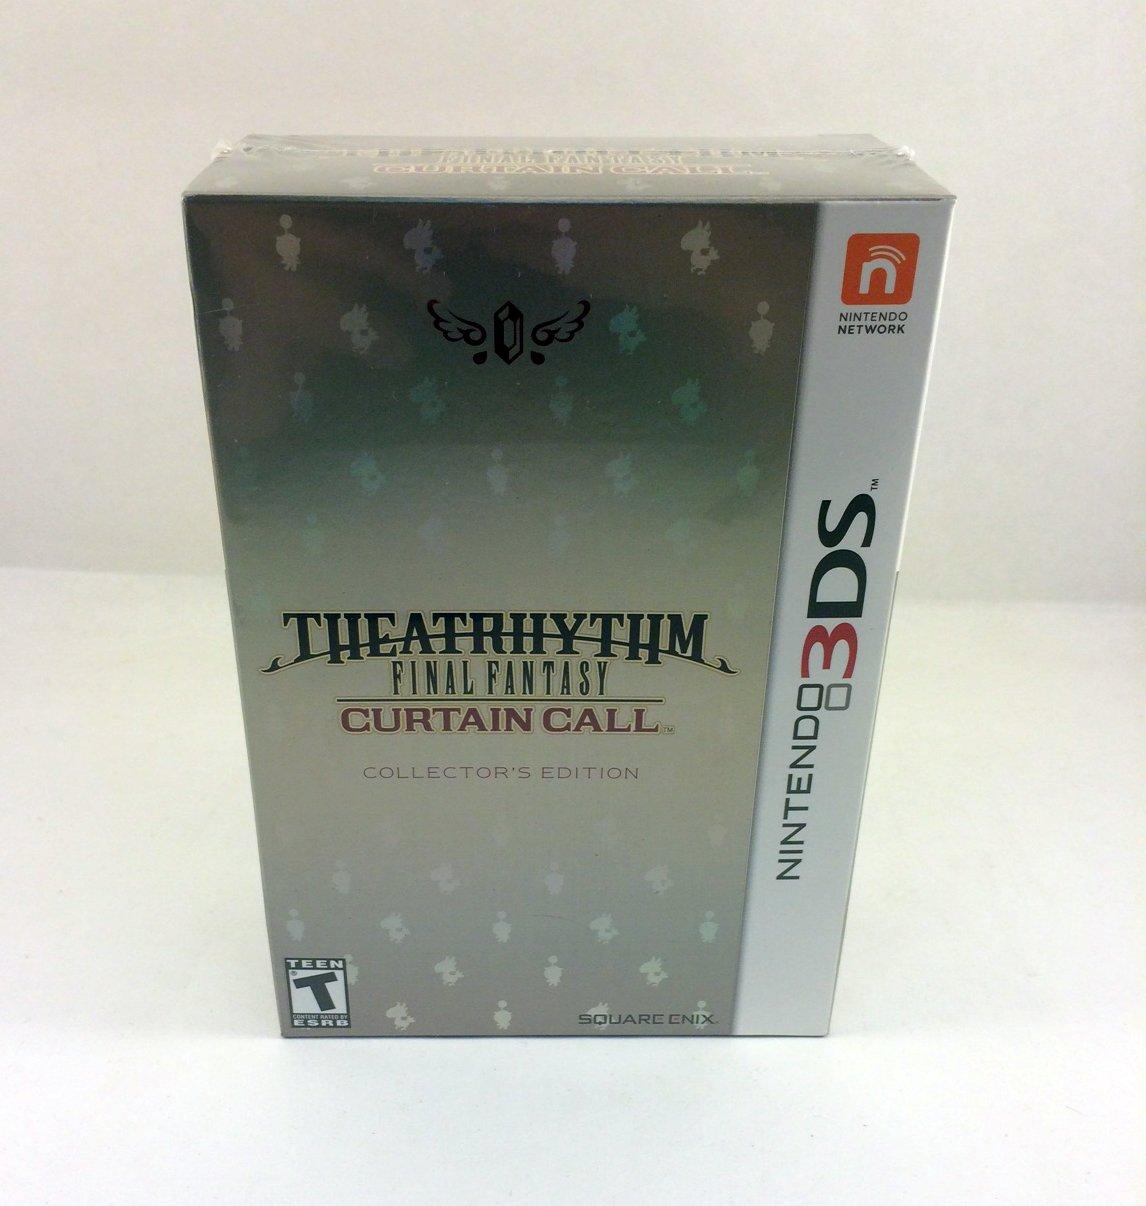 Theatrhythm Final OFFicial shop Fantasy Curtain Japan Maker New Call: Edition Collector's